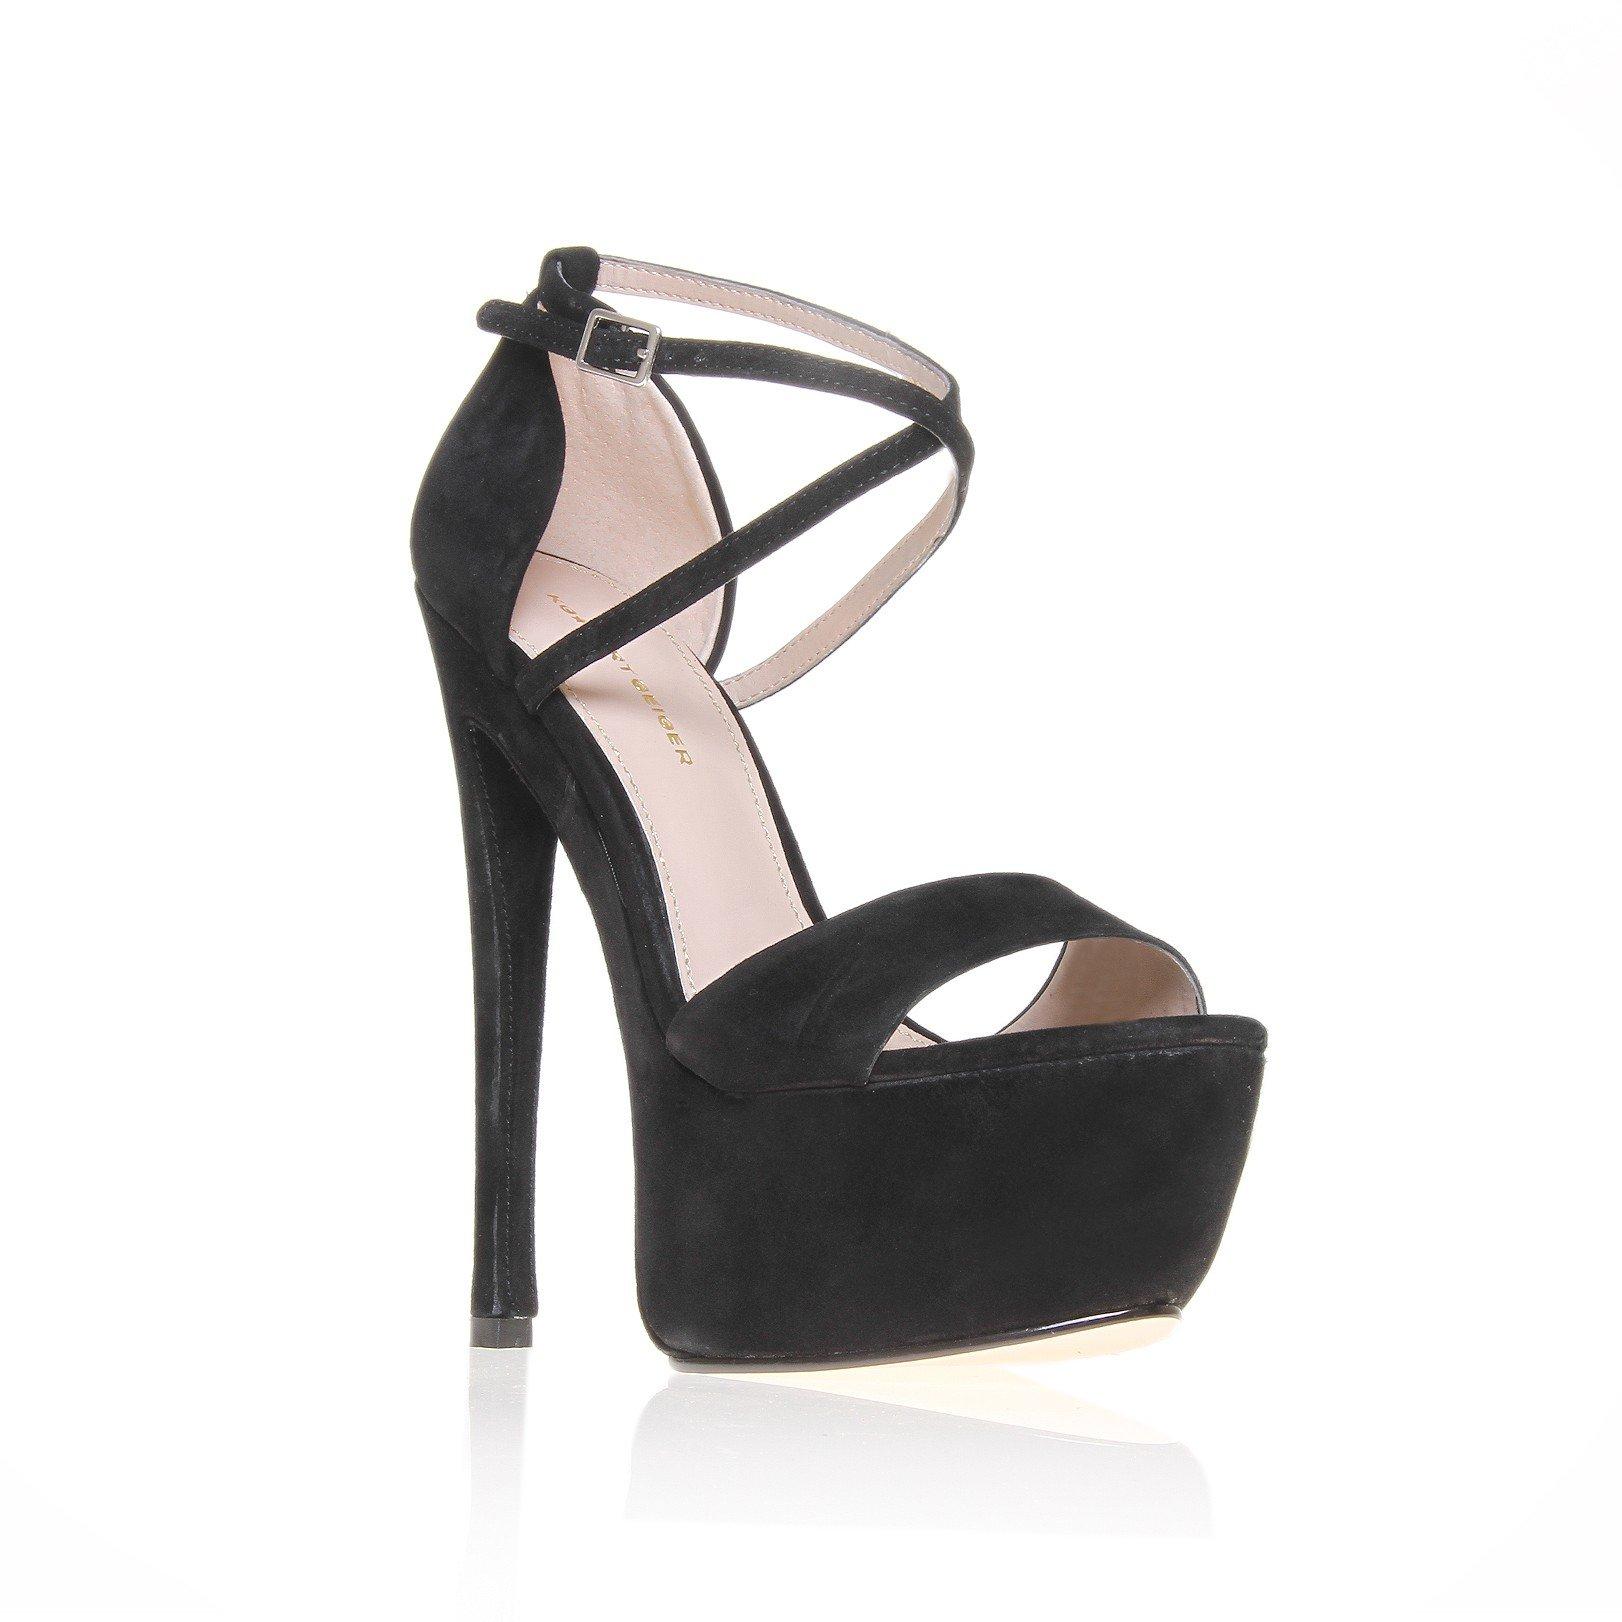 Kg Kurt Geiger Nanette glitter platform sandals